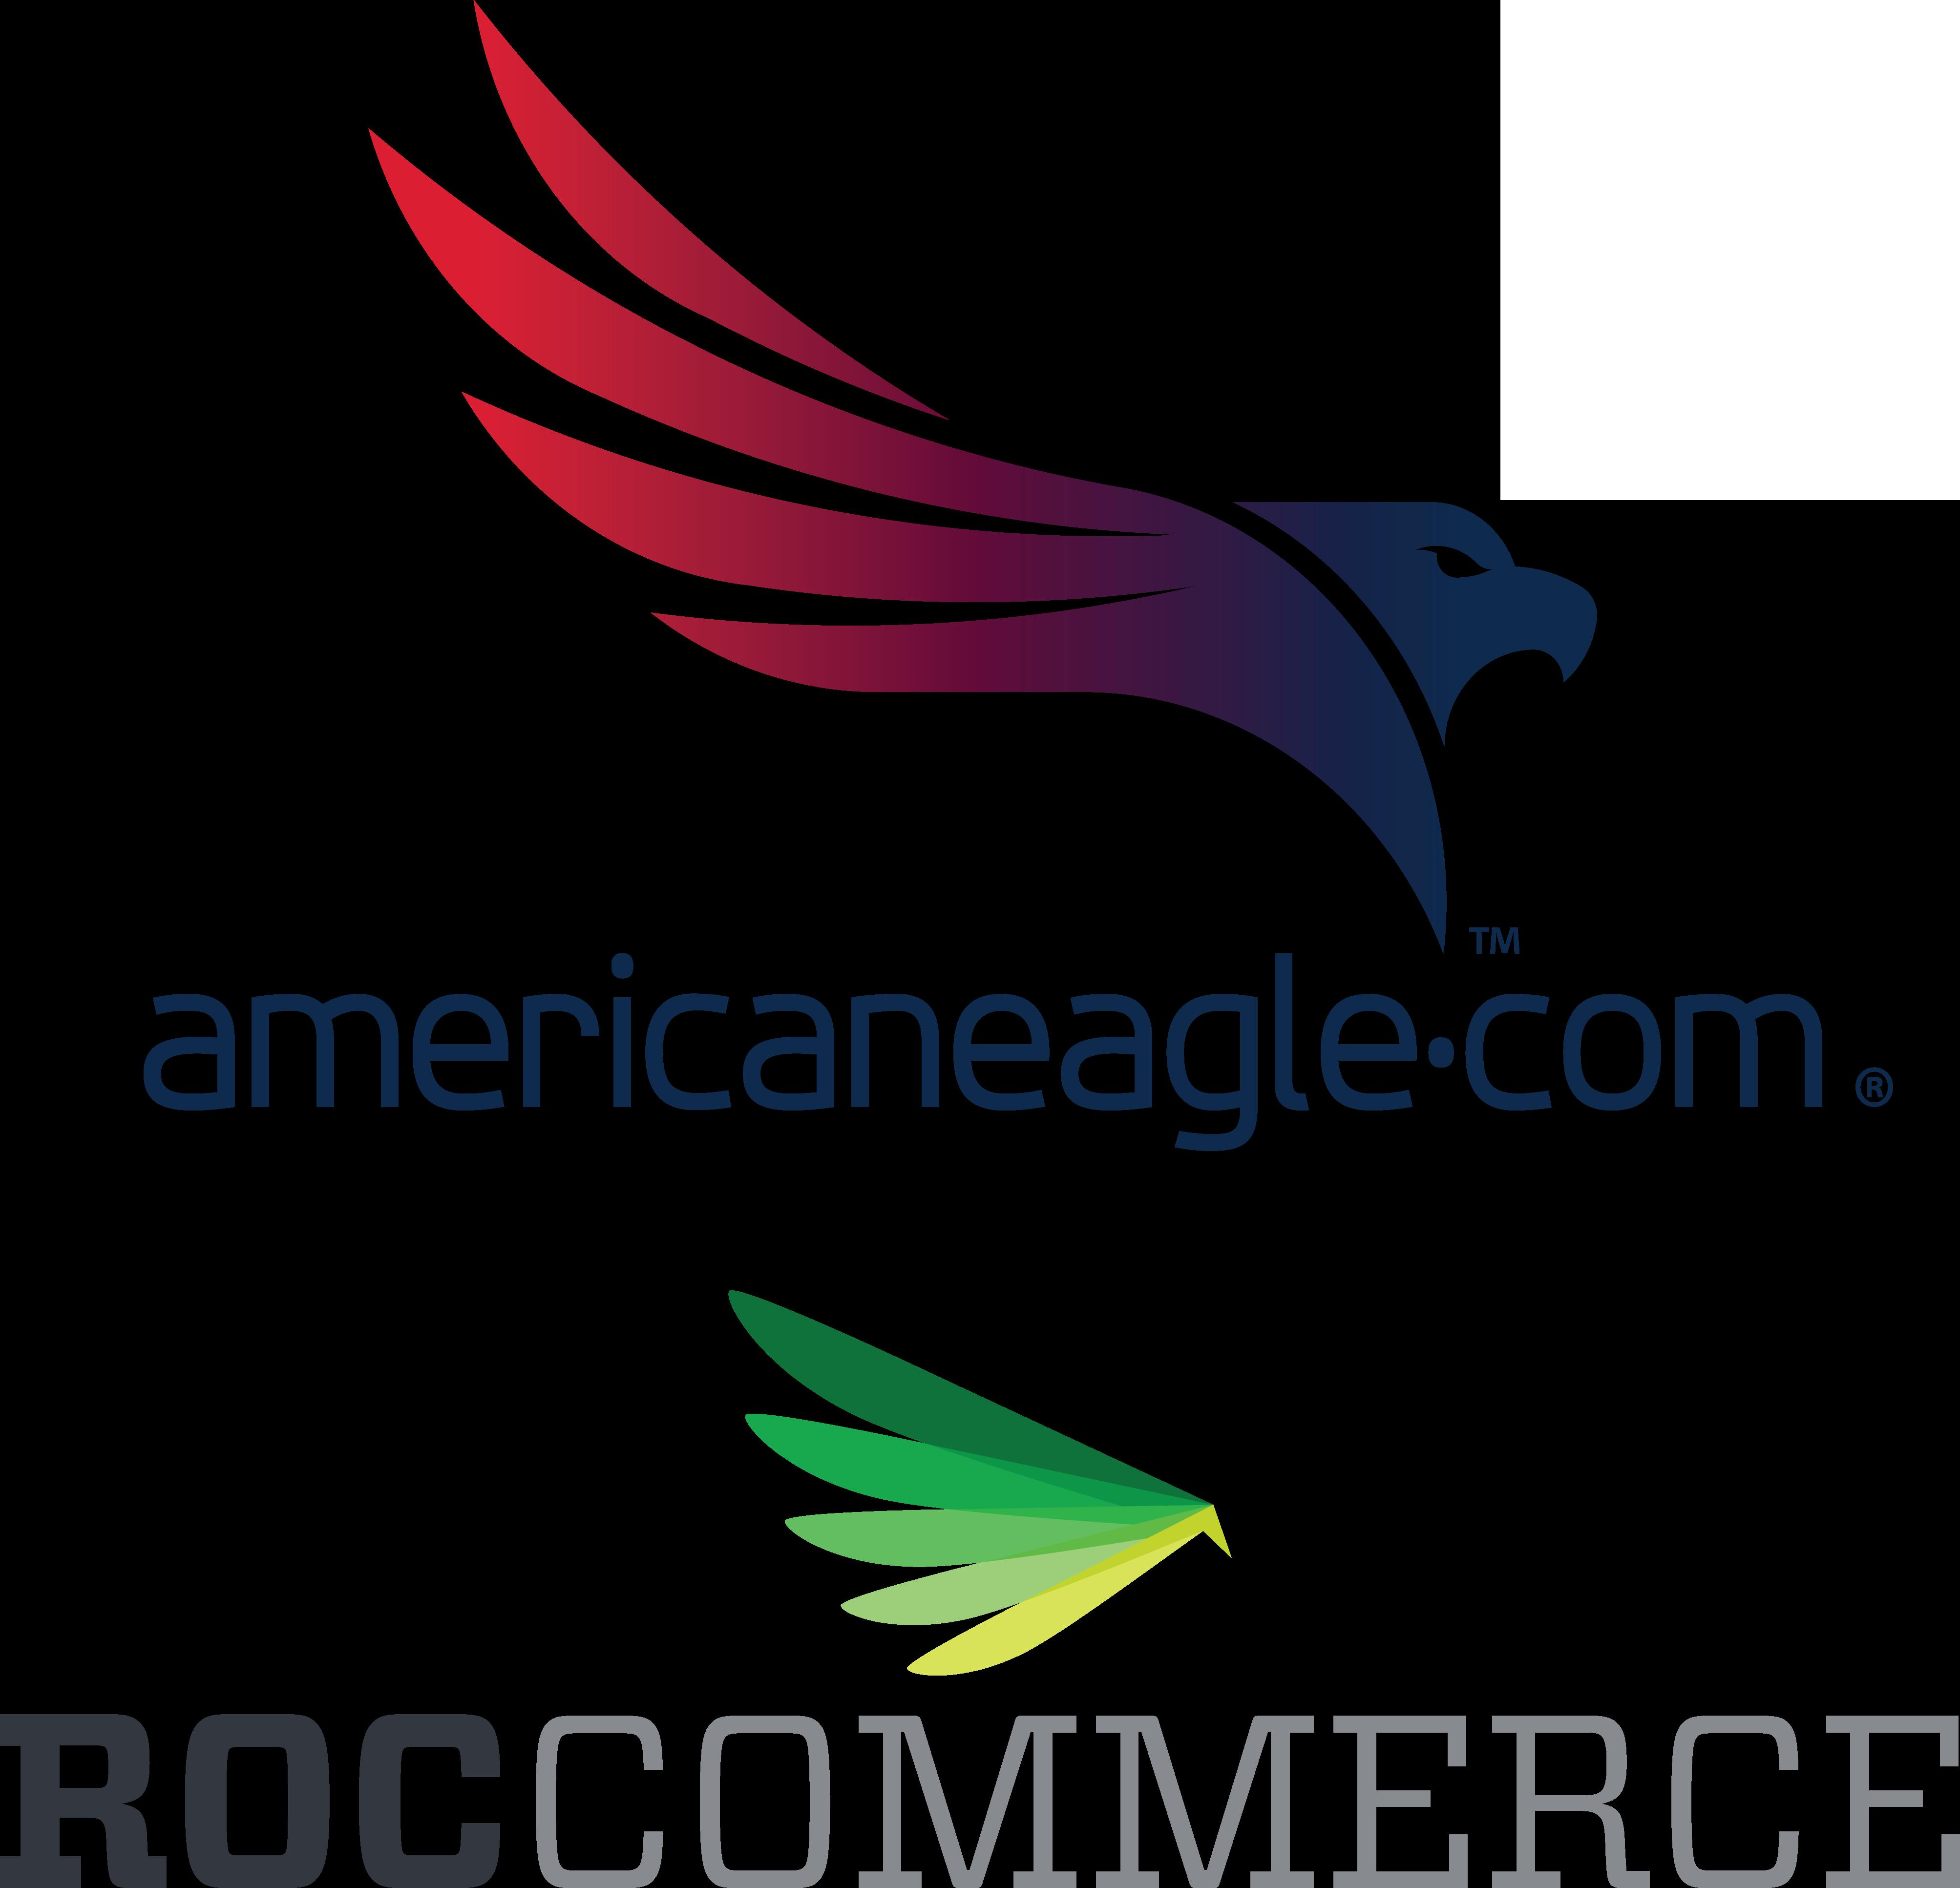 American Eagle/ROC Commerce